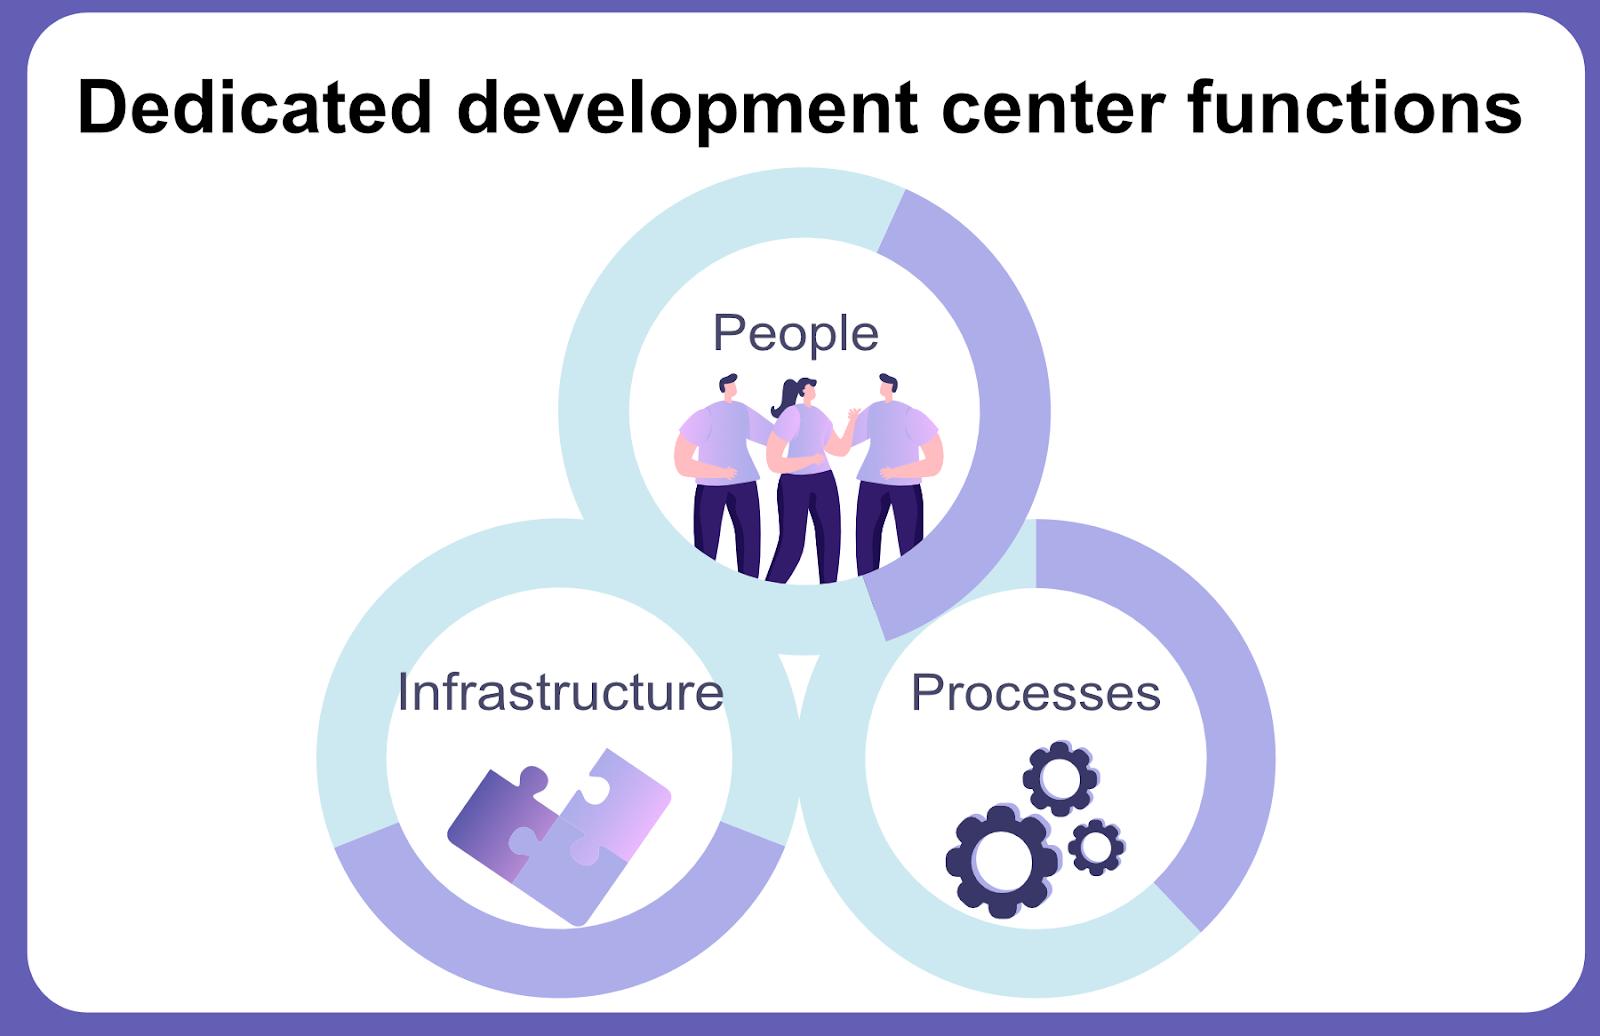 Dedicated development center functions